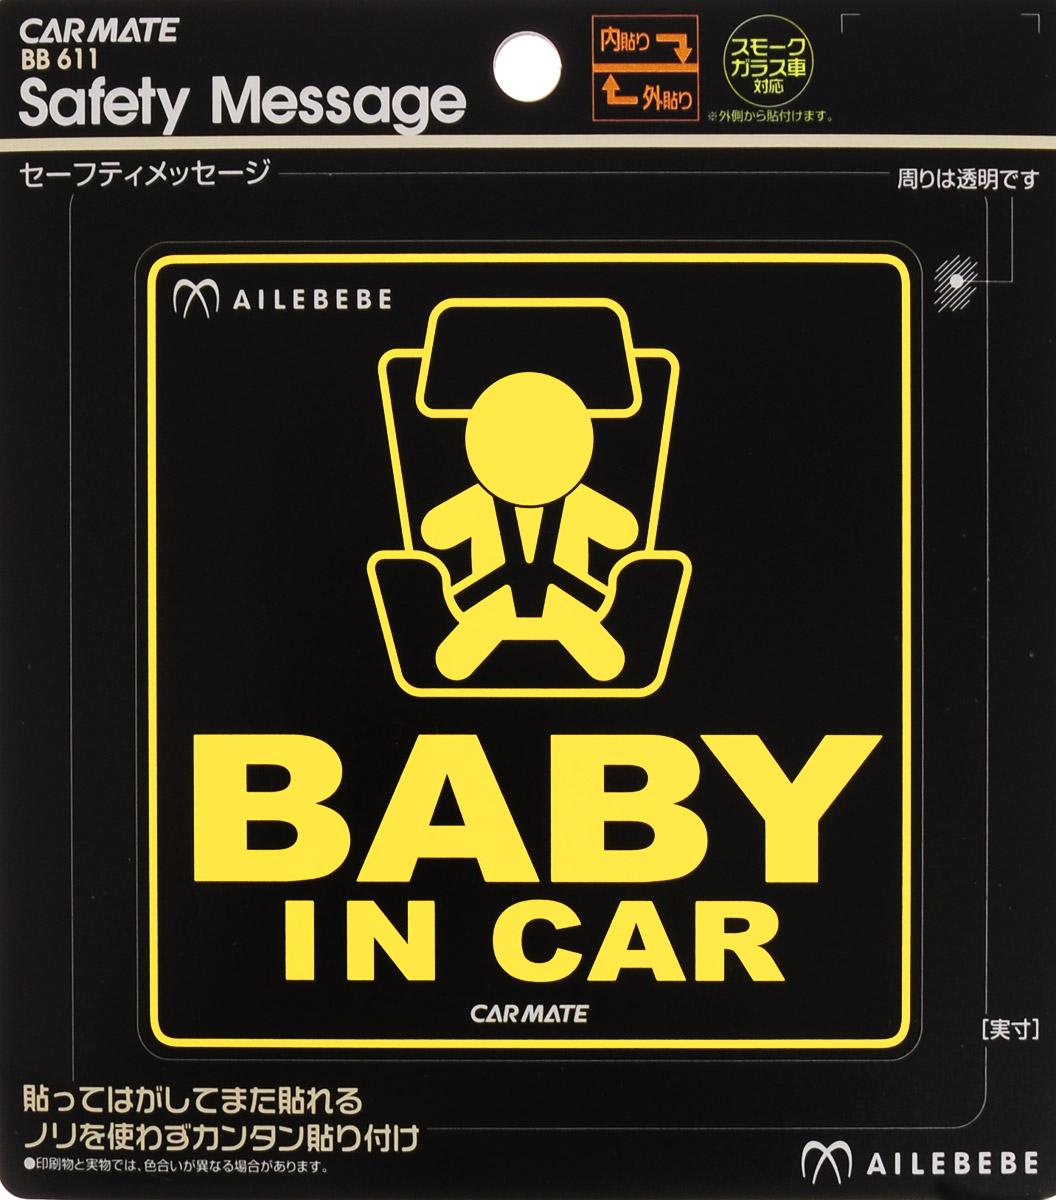 Купить AILEBEBE Наклейка автомобильная Baby in car, Carmate